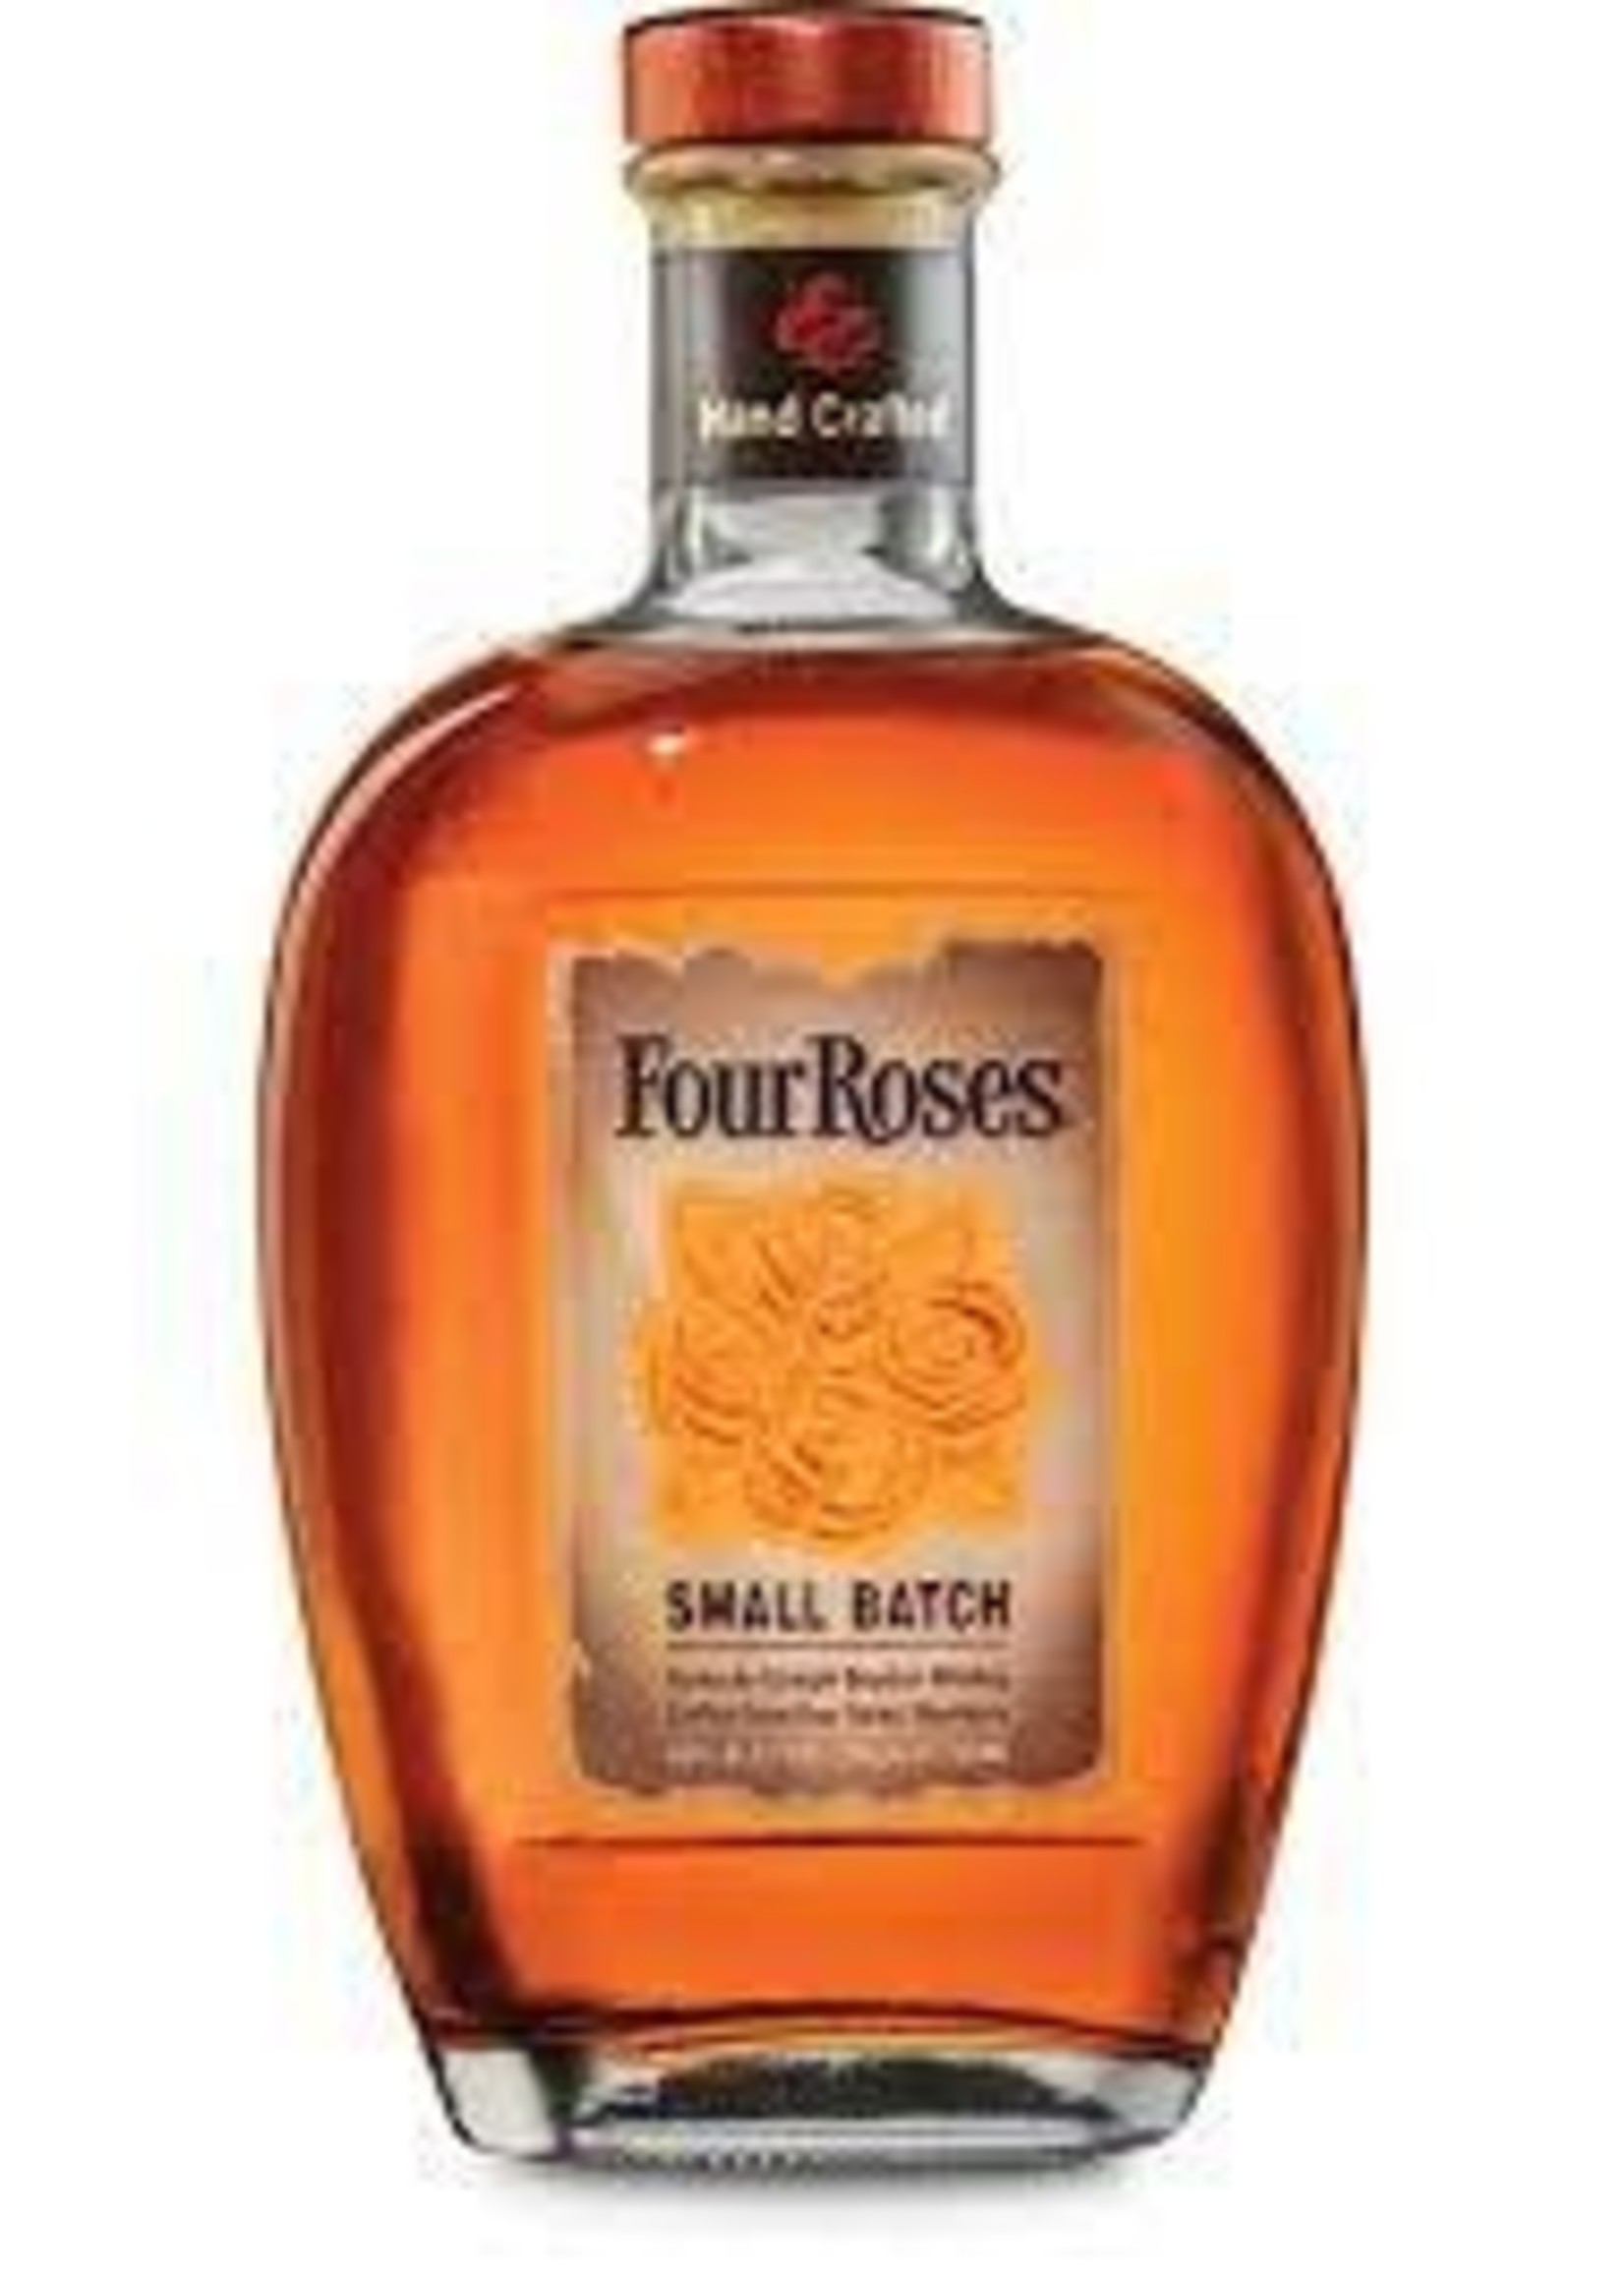 Four Roses Bourbon Small Batch 90PF 750ml